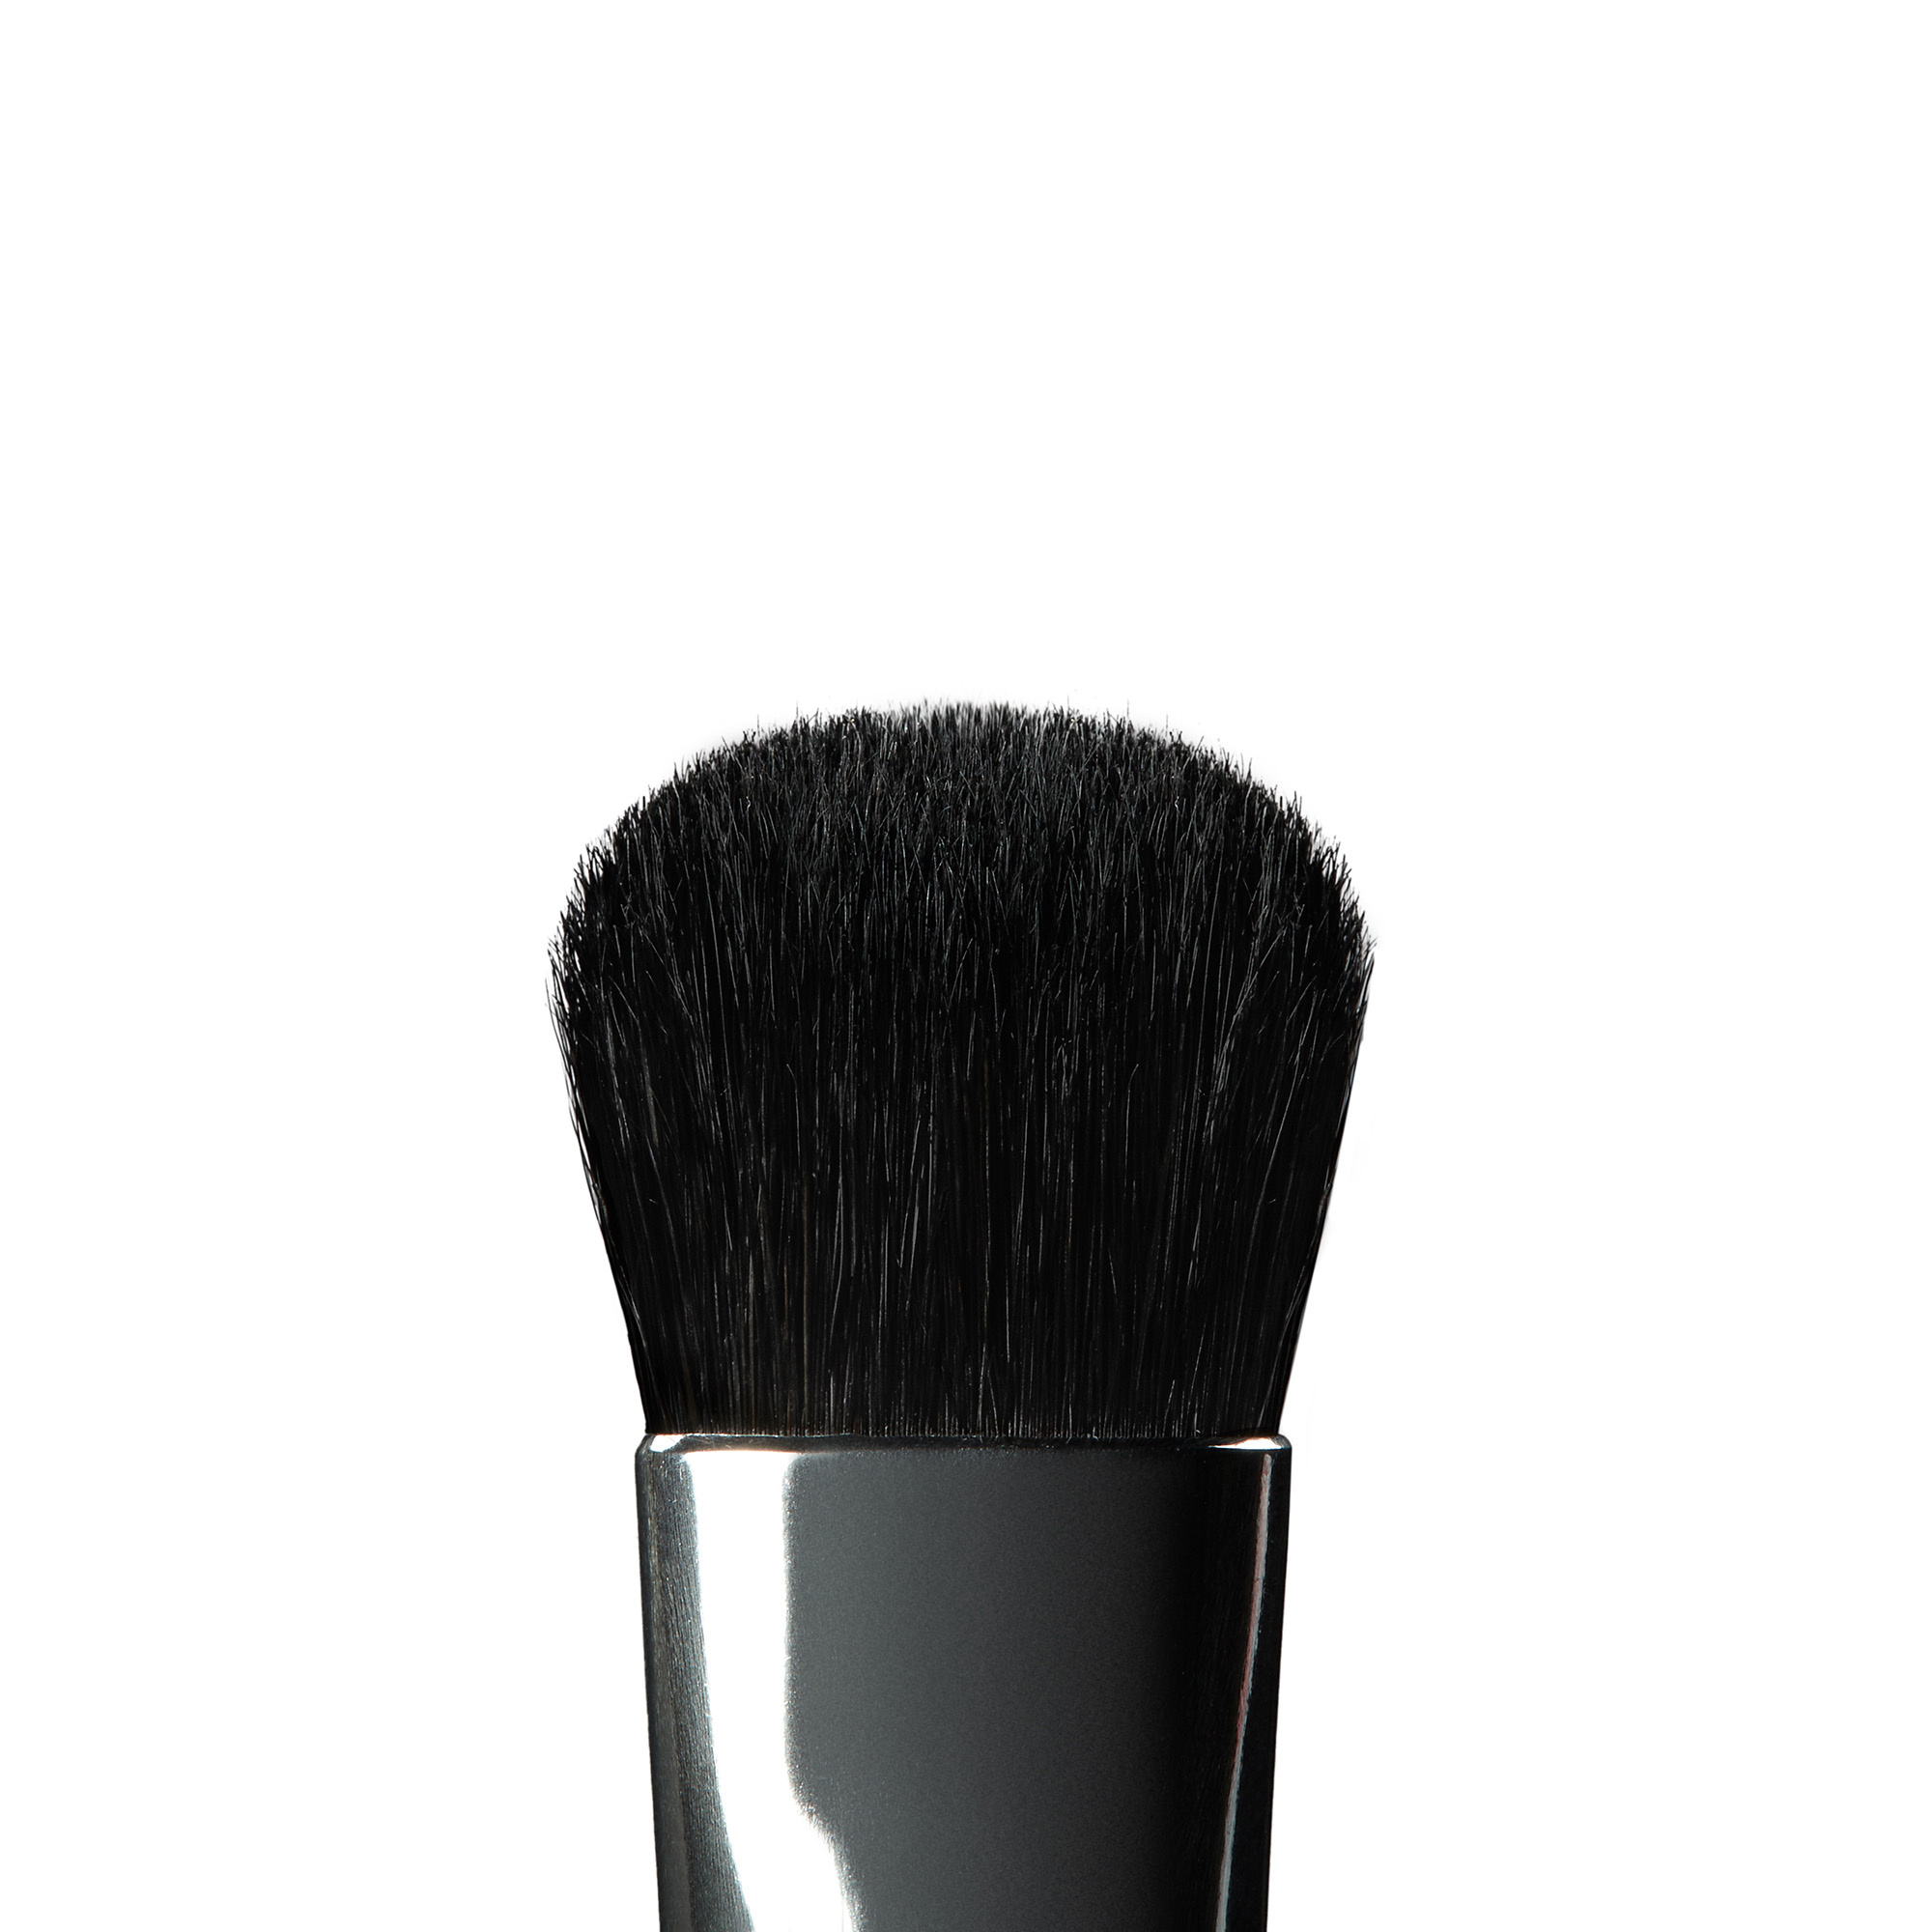 A13 Pro Brush - Medium Shader Brush